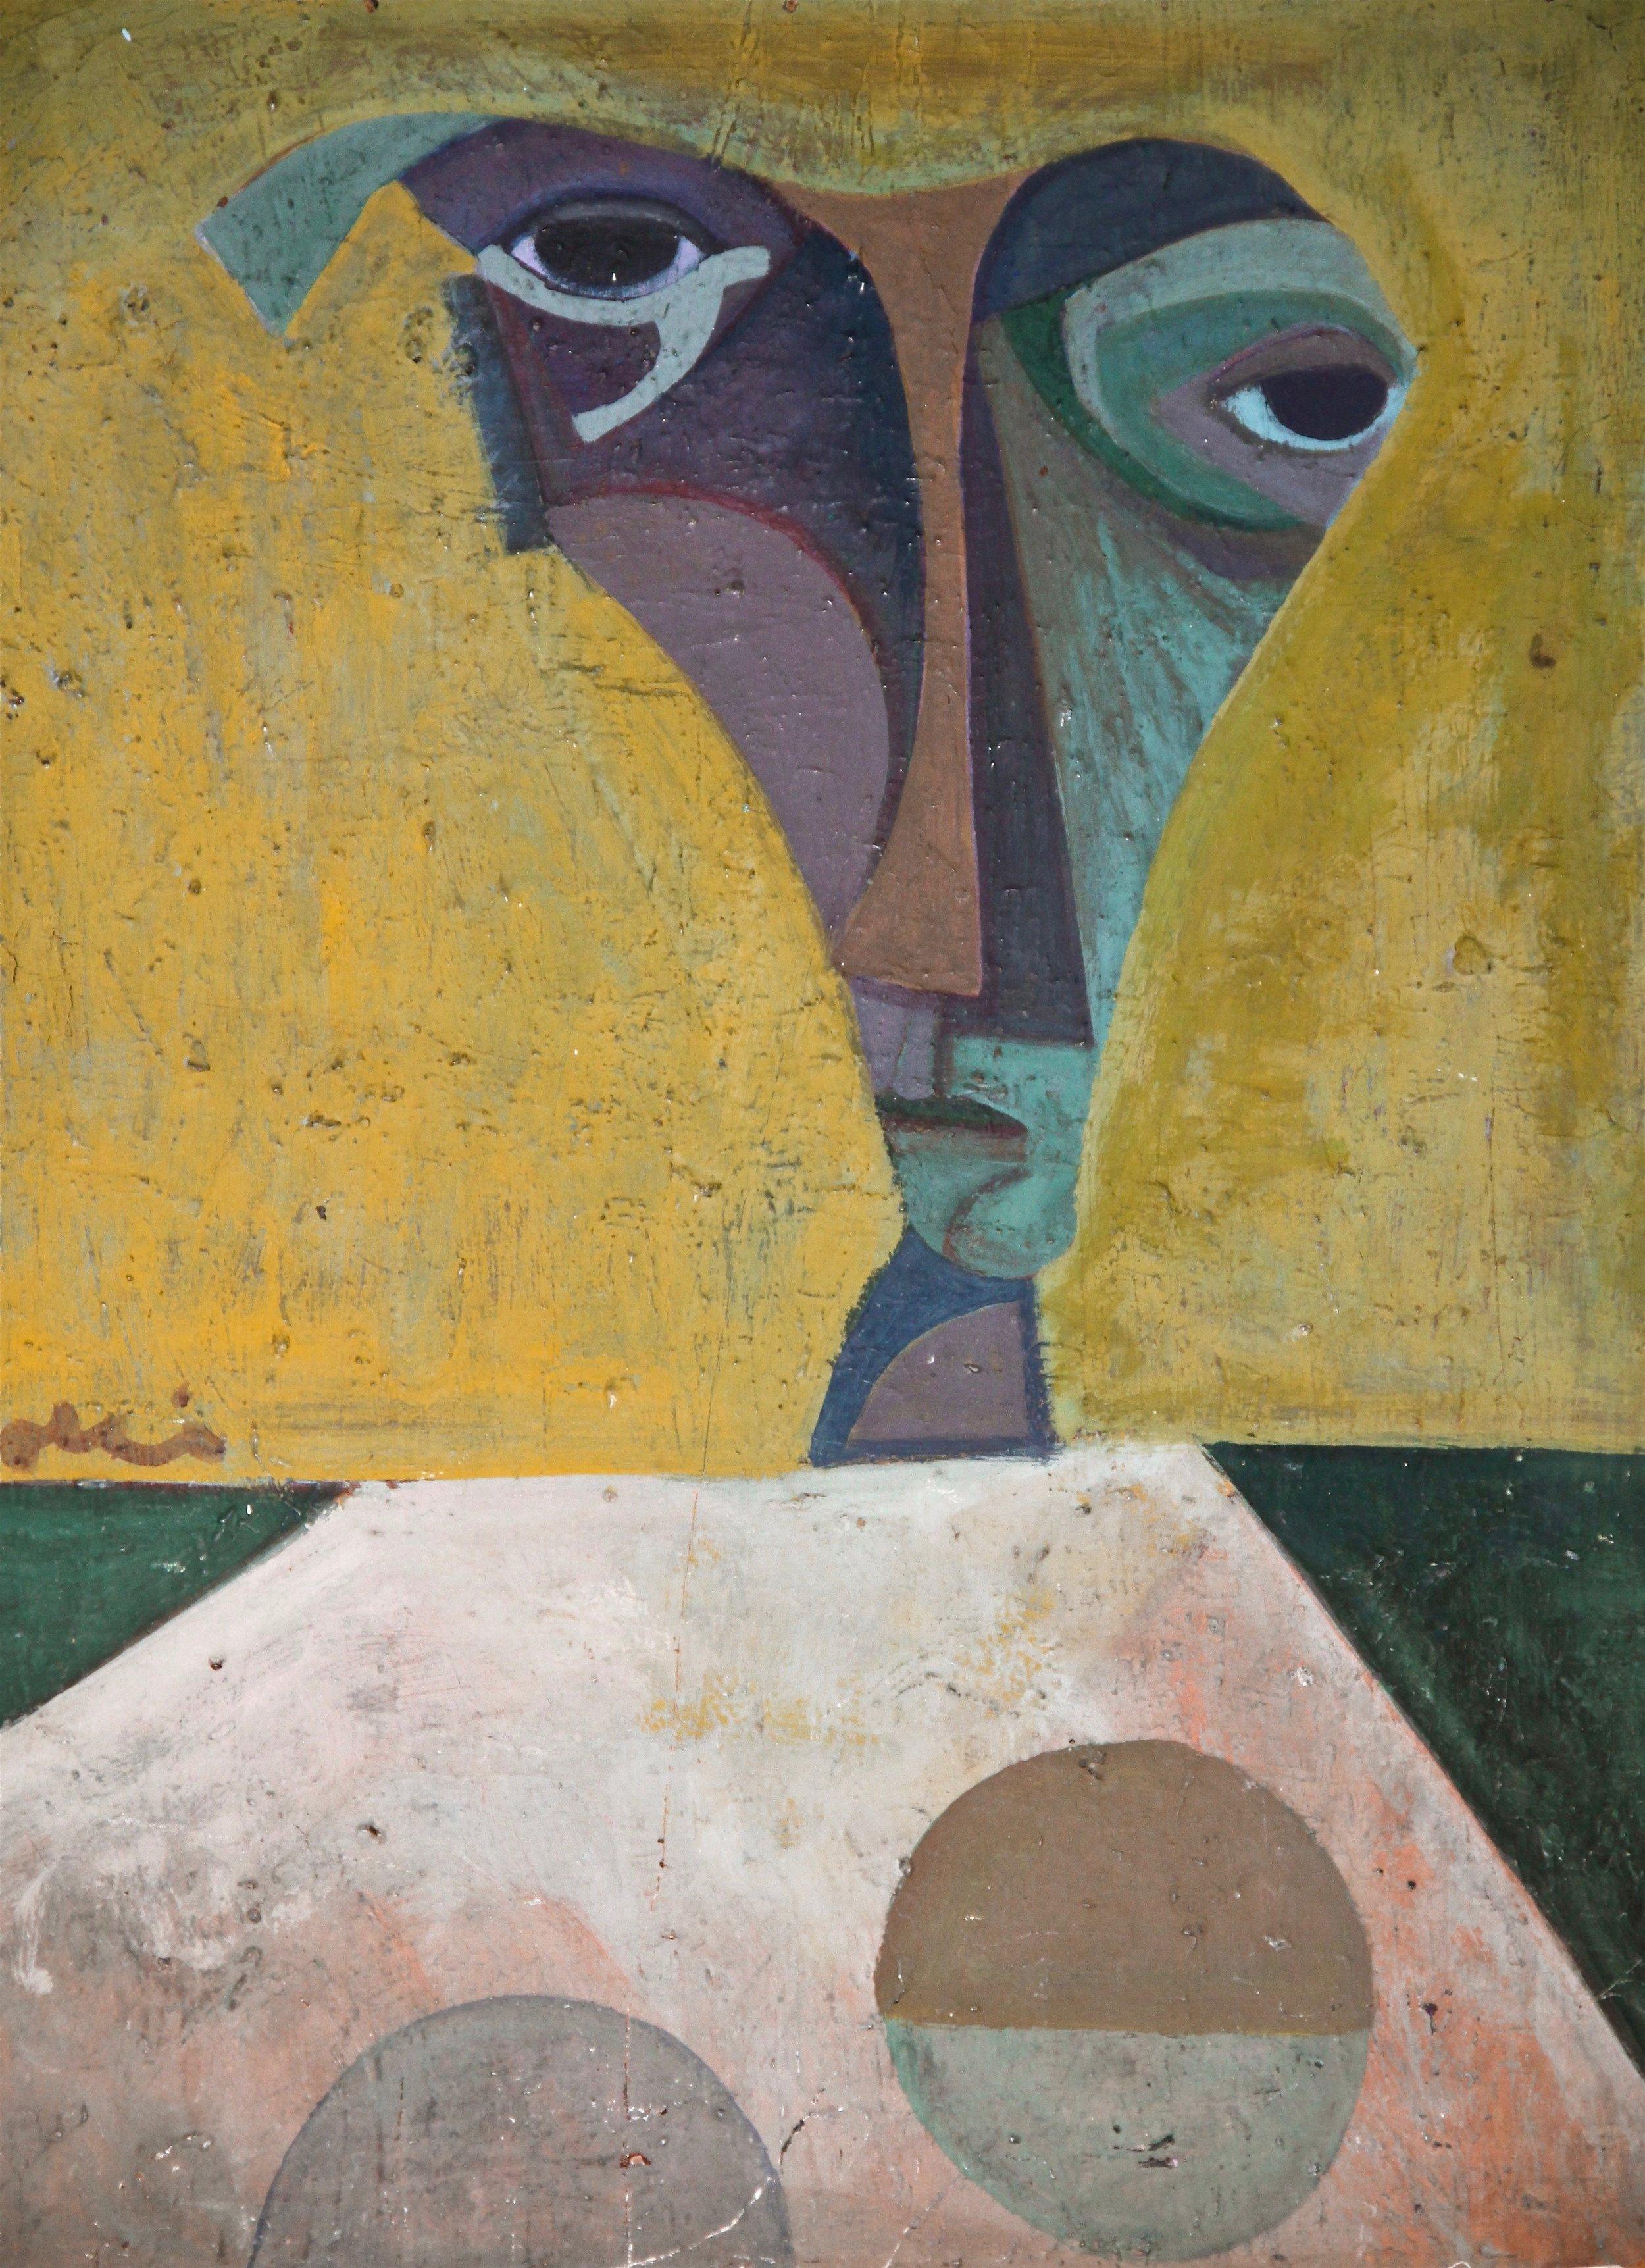 Ahmed-Morsi-Head-of-Woman-1972.jpg